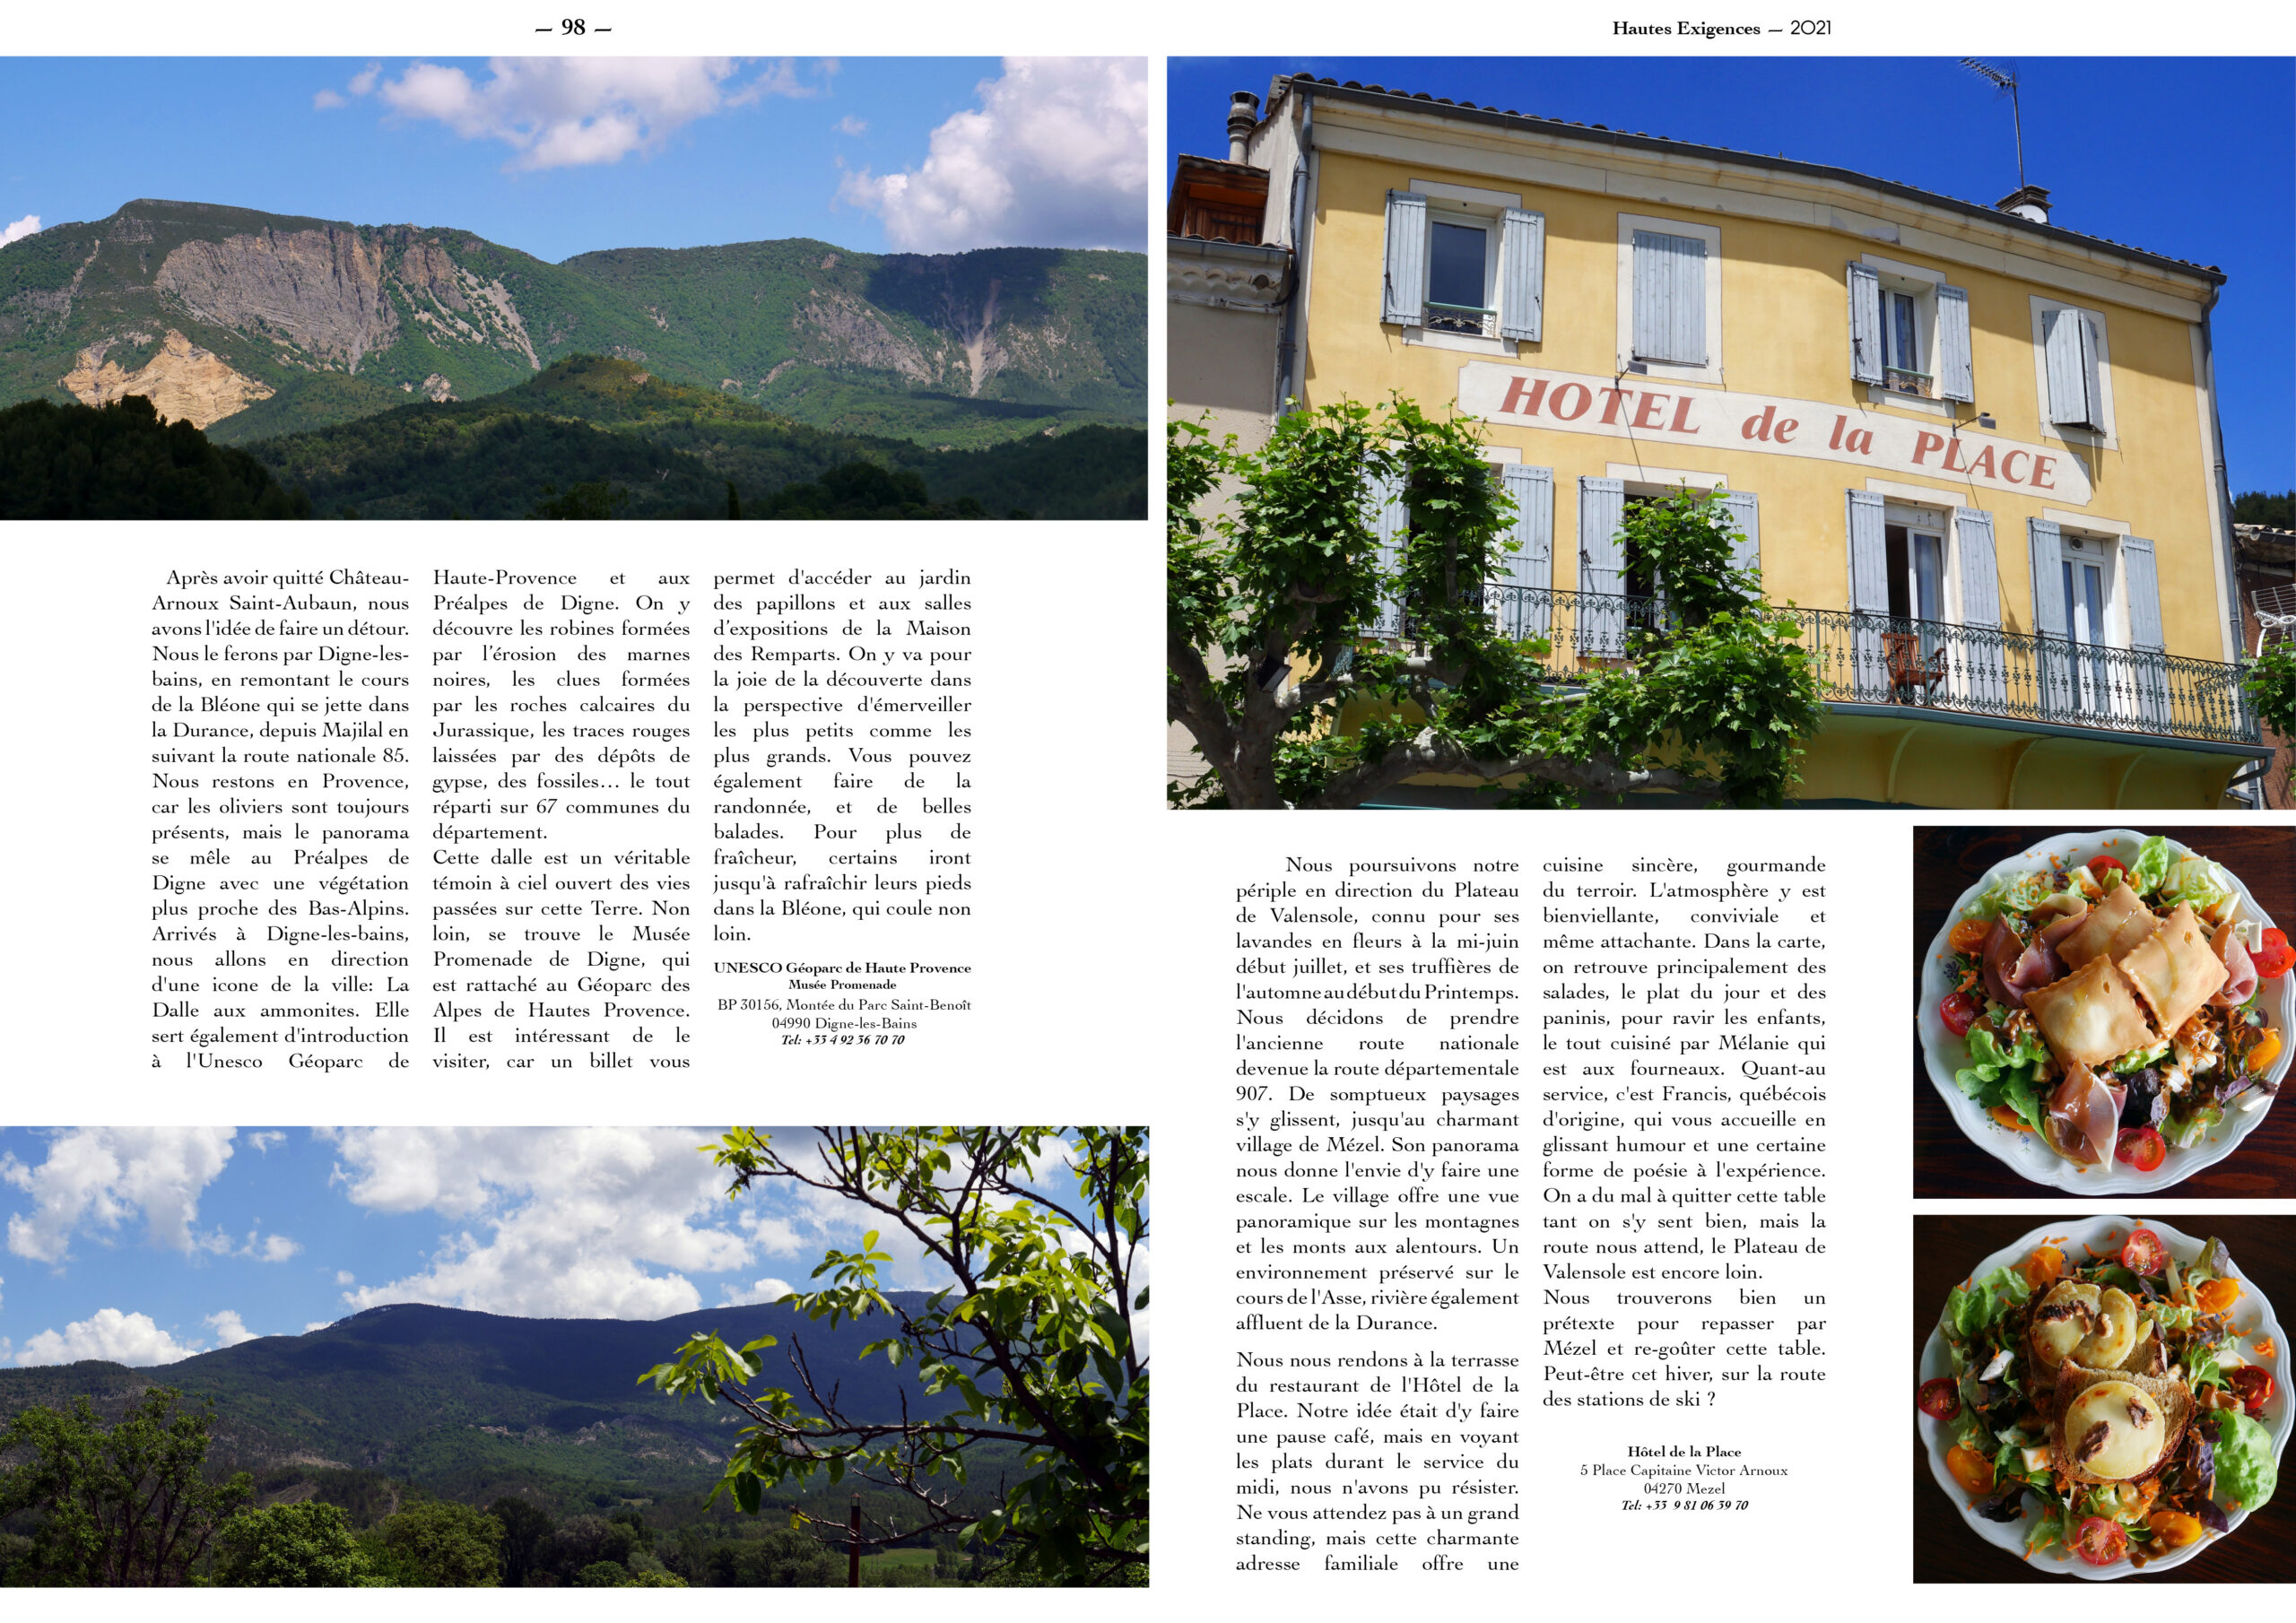 Hautes Exigences Magazine Hors Serie 2021 page 96-97